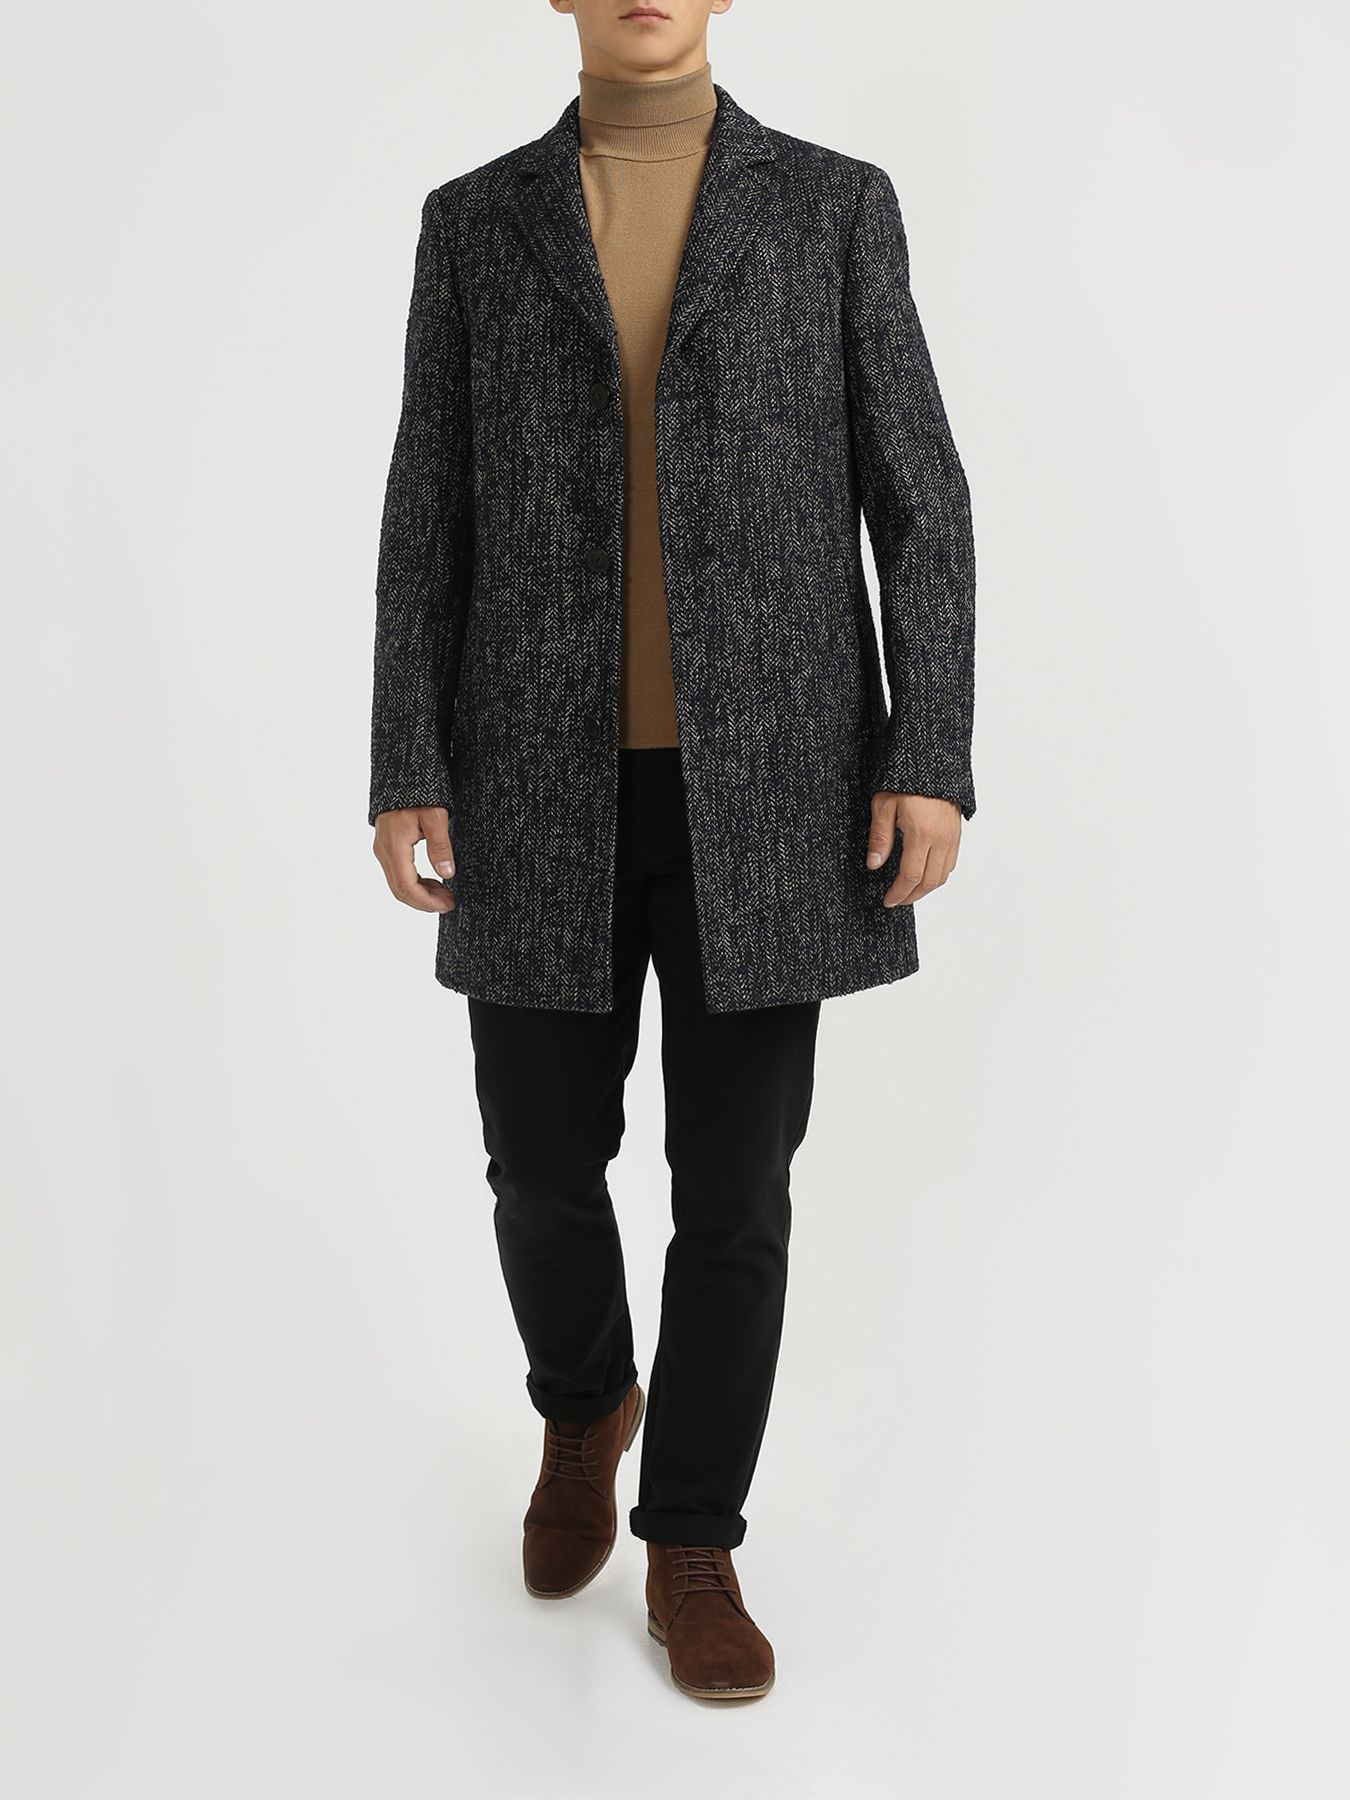 Пальто Ritter Мужское пальто